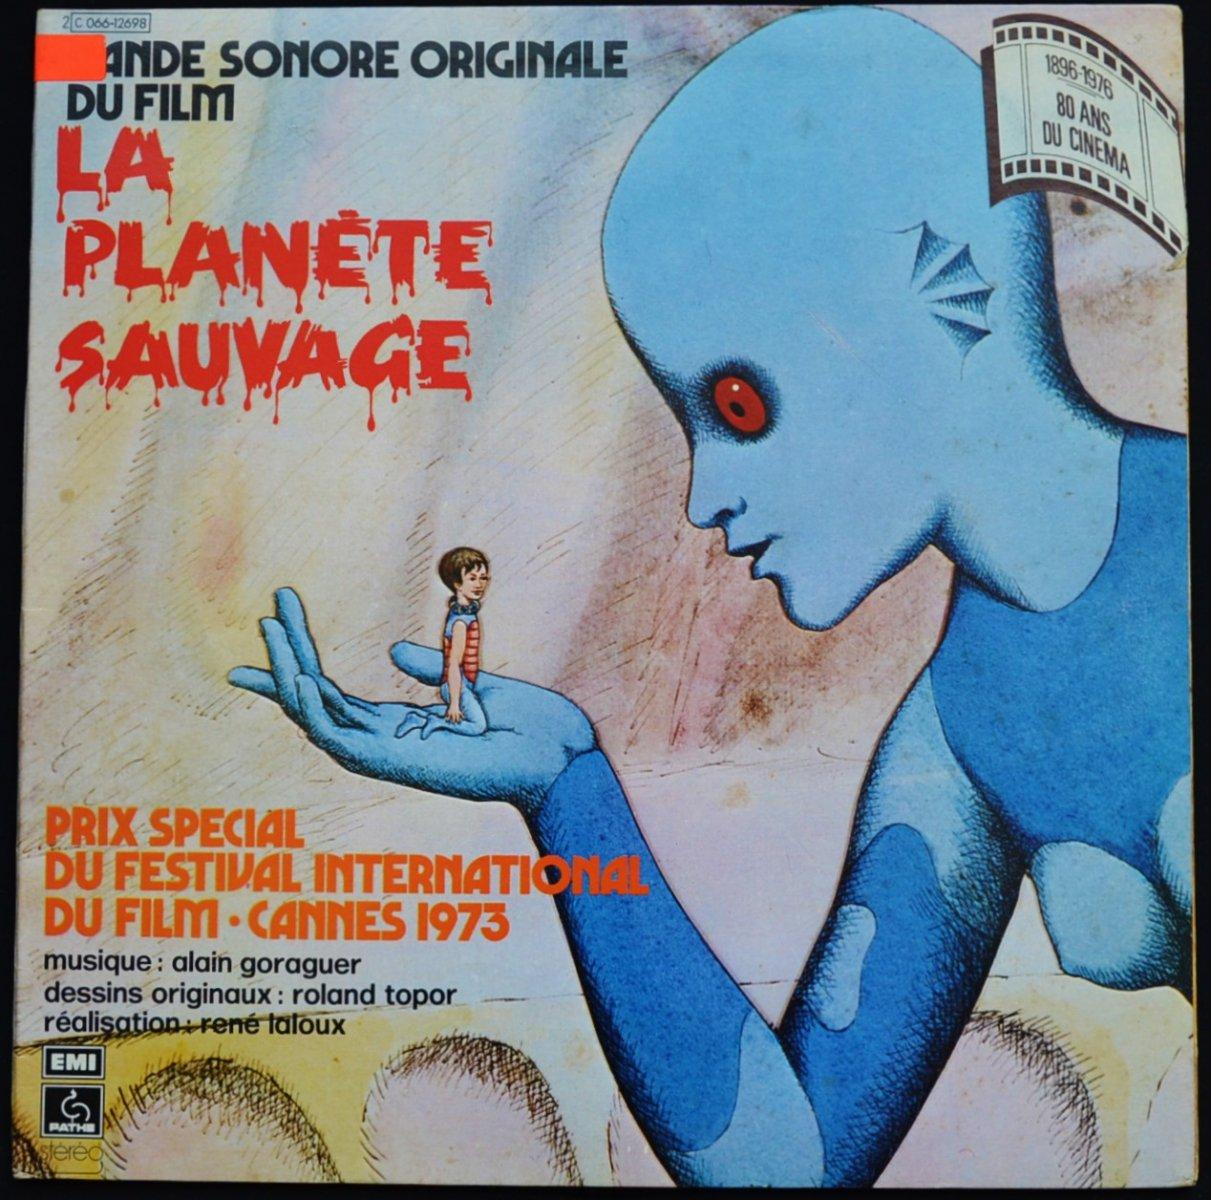 ALAIN GORAGUER / LA PLANETE SAUVAGE (BANDE SONORE ORIGINALE) (LP)